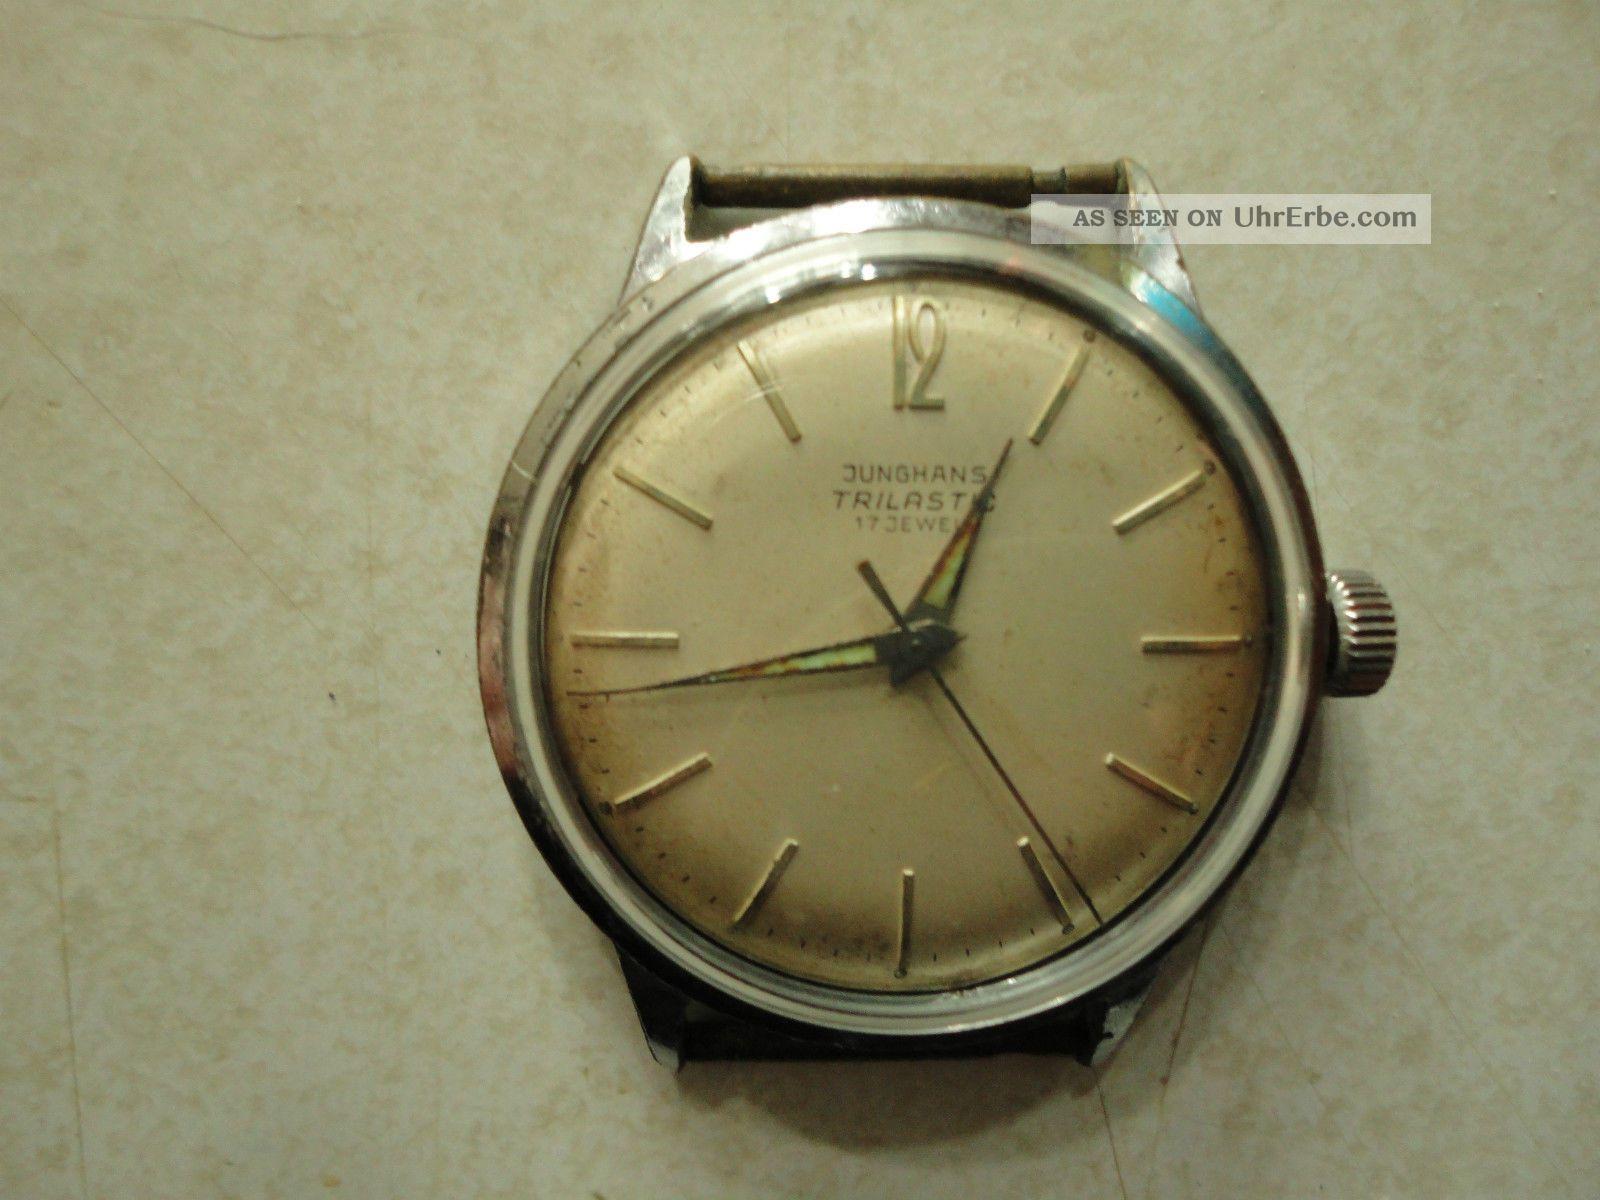 Junghans Trilastic 17 Jewels,  Edelstahlgehäuse,  Handaufzug. Armbanduhren Bild